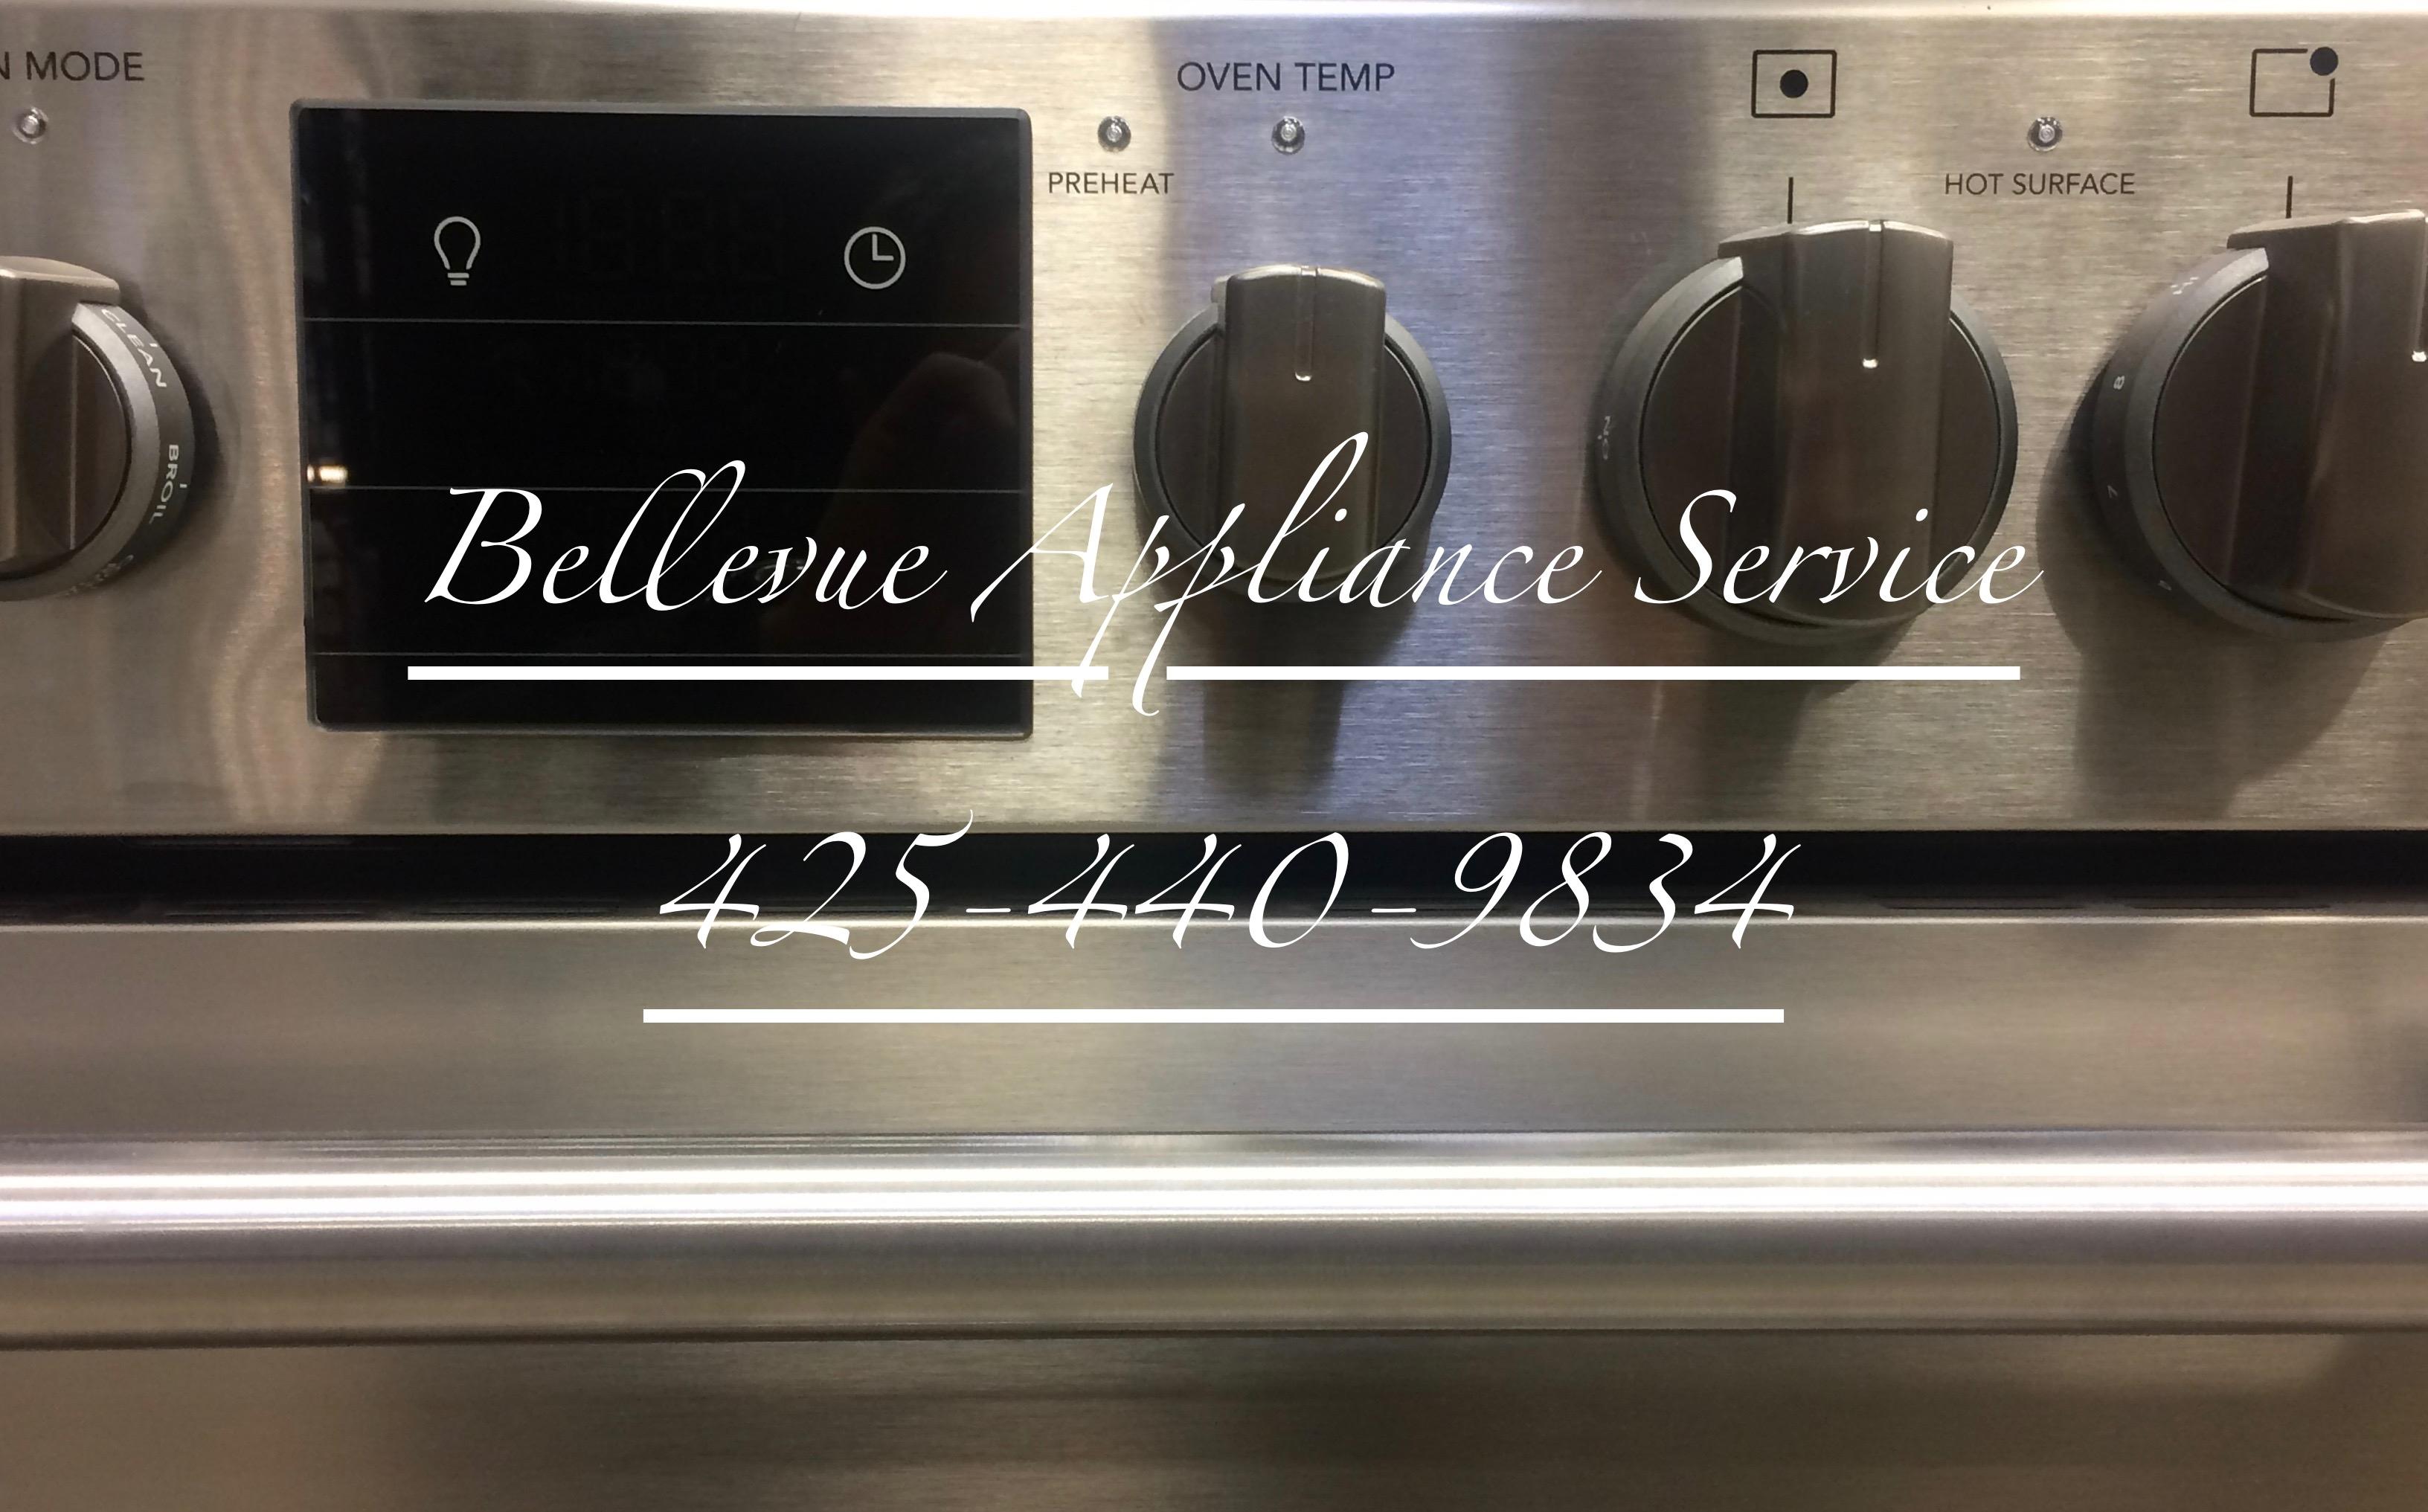 Bellevue Appliance Service image 4